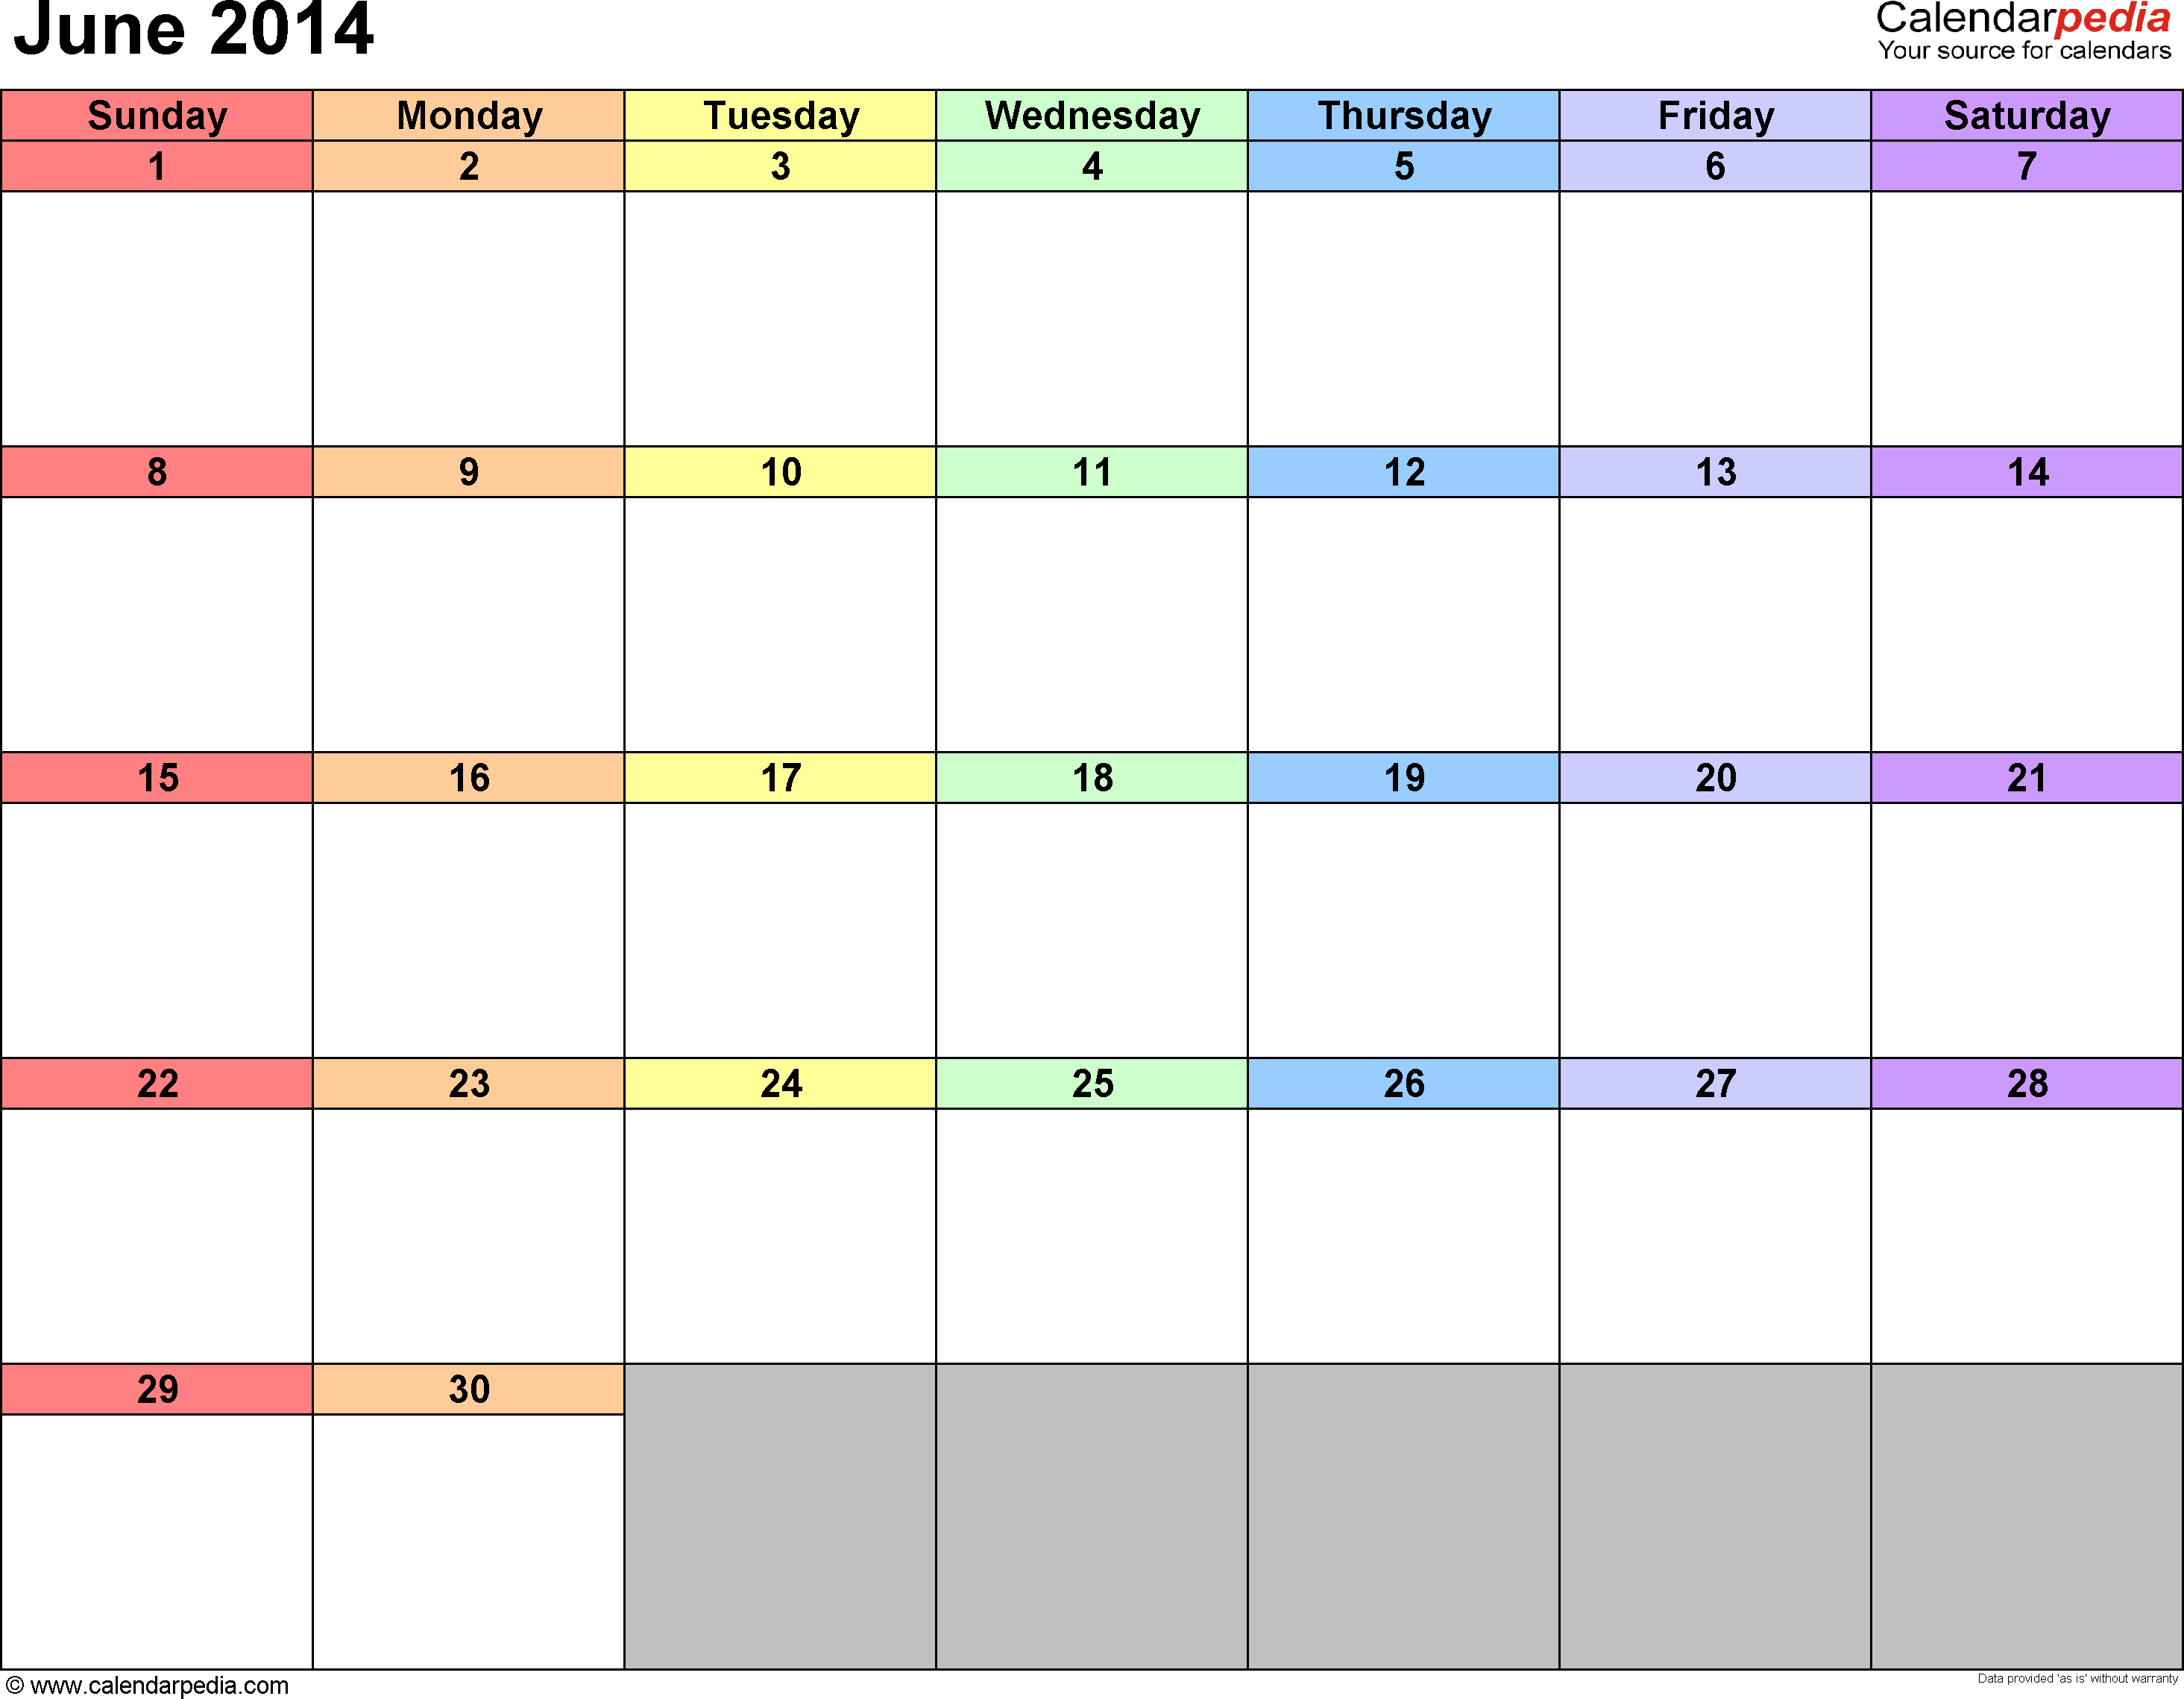 June 2014 Calendar With Holidays June 2014 Calendar Free